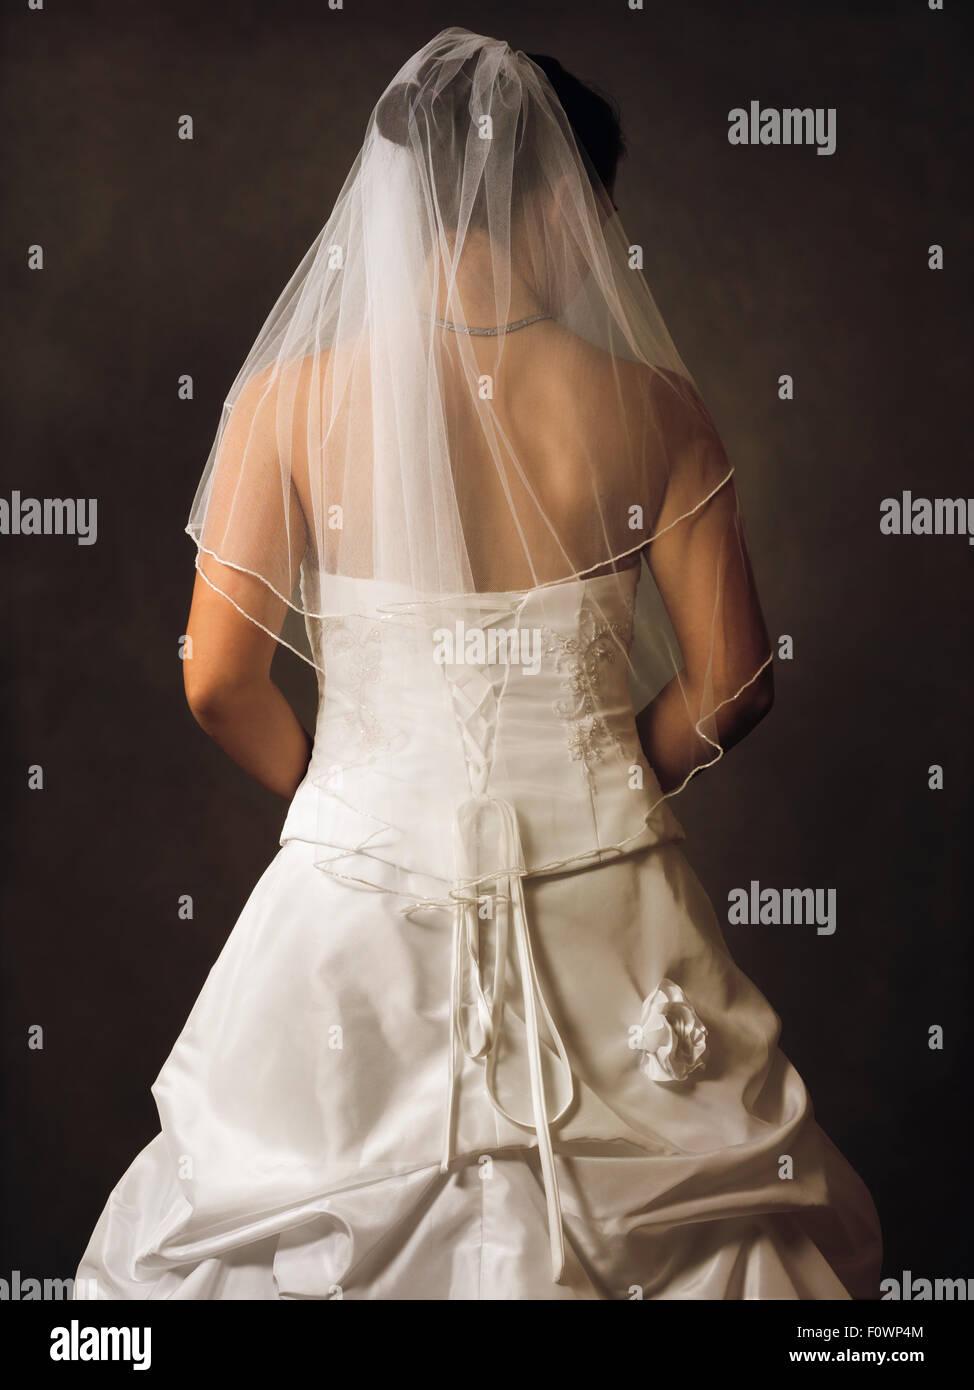 Farthingale Stockfotos & Farthingale Bilder - Alamy